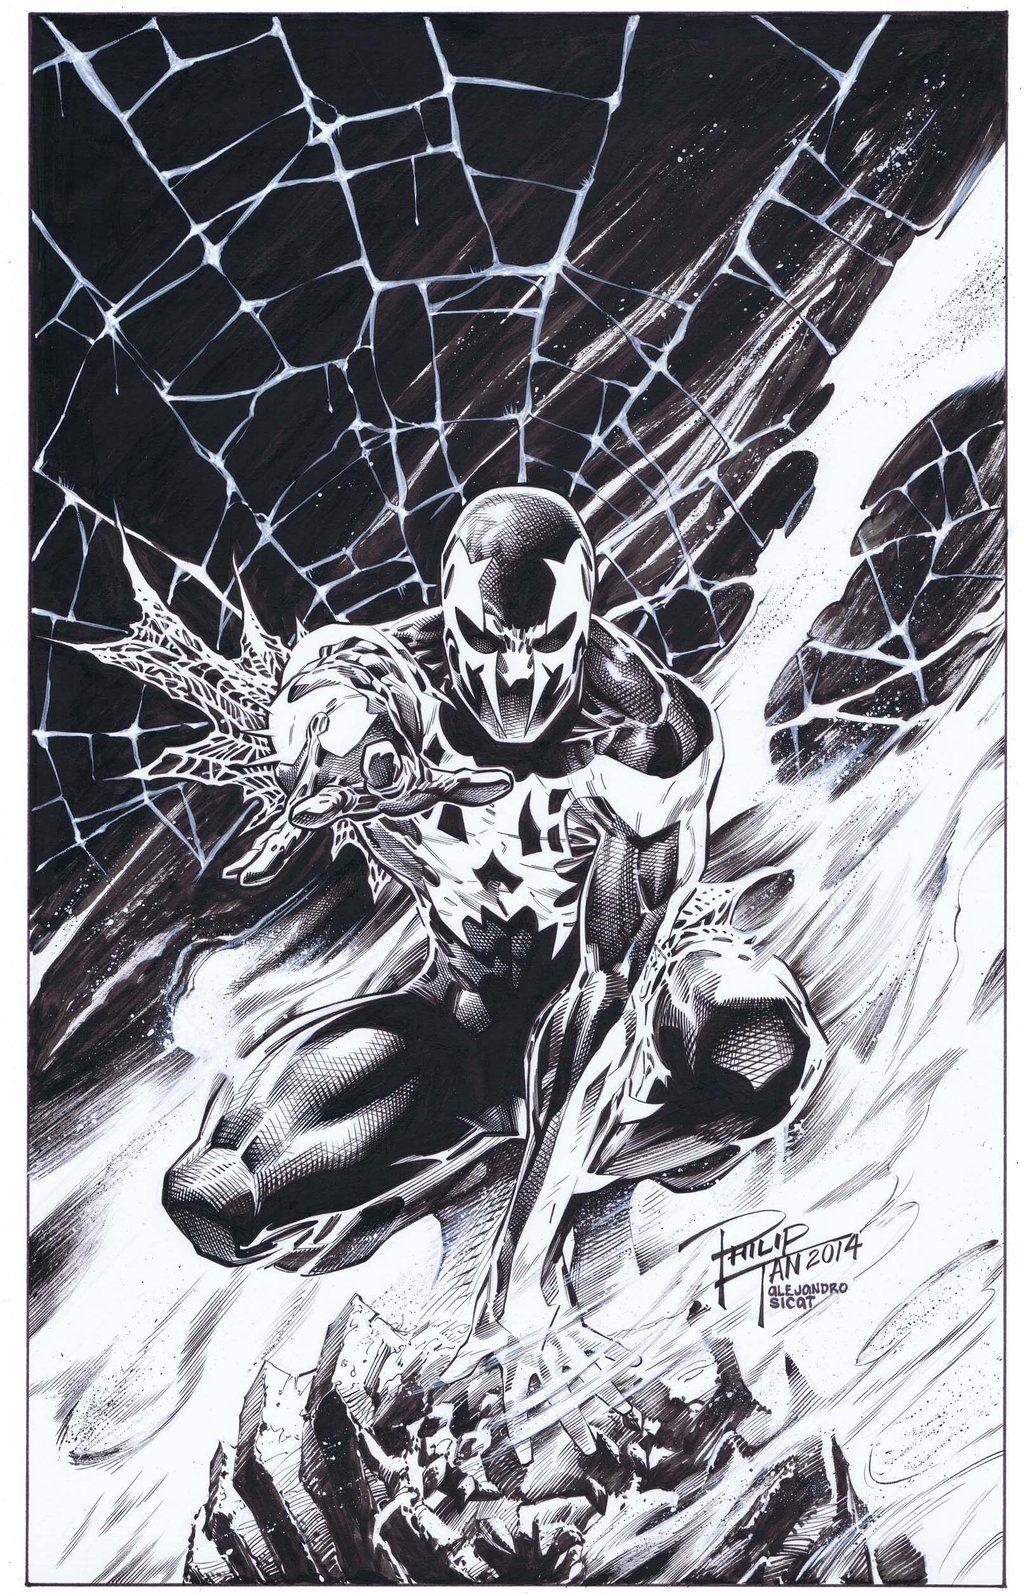 Spider-man 2099: Philip Tan by boysicat on DeviantArt